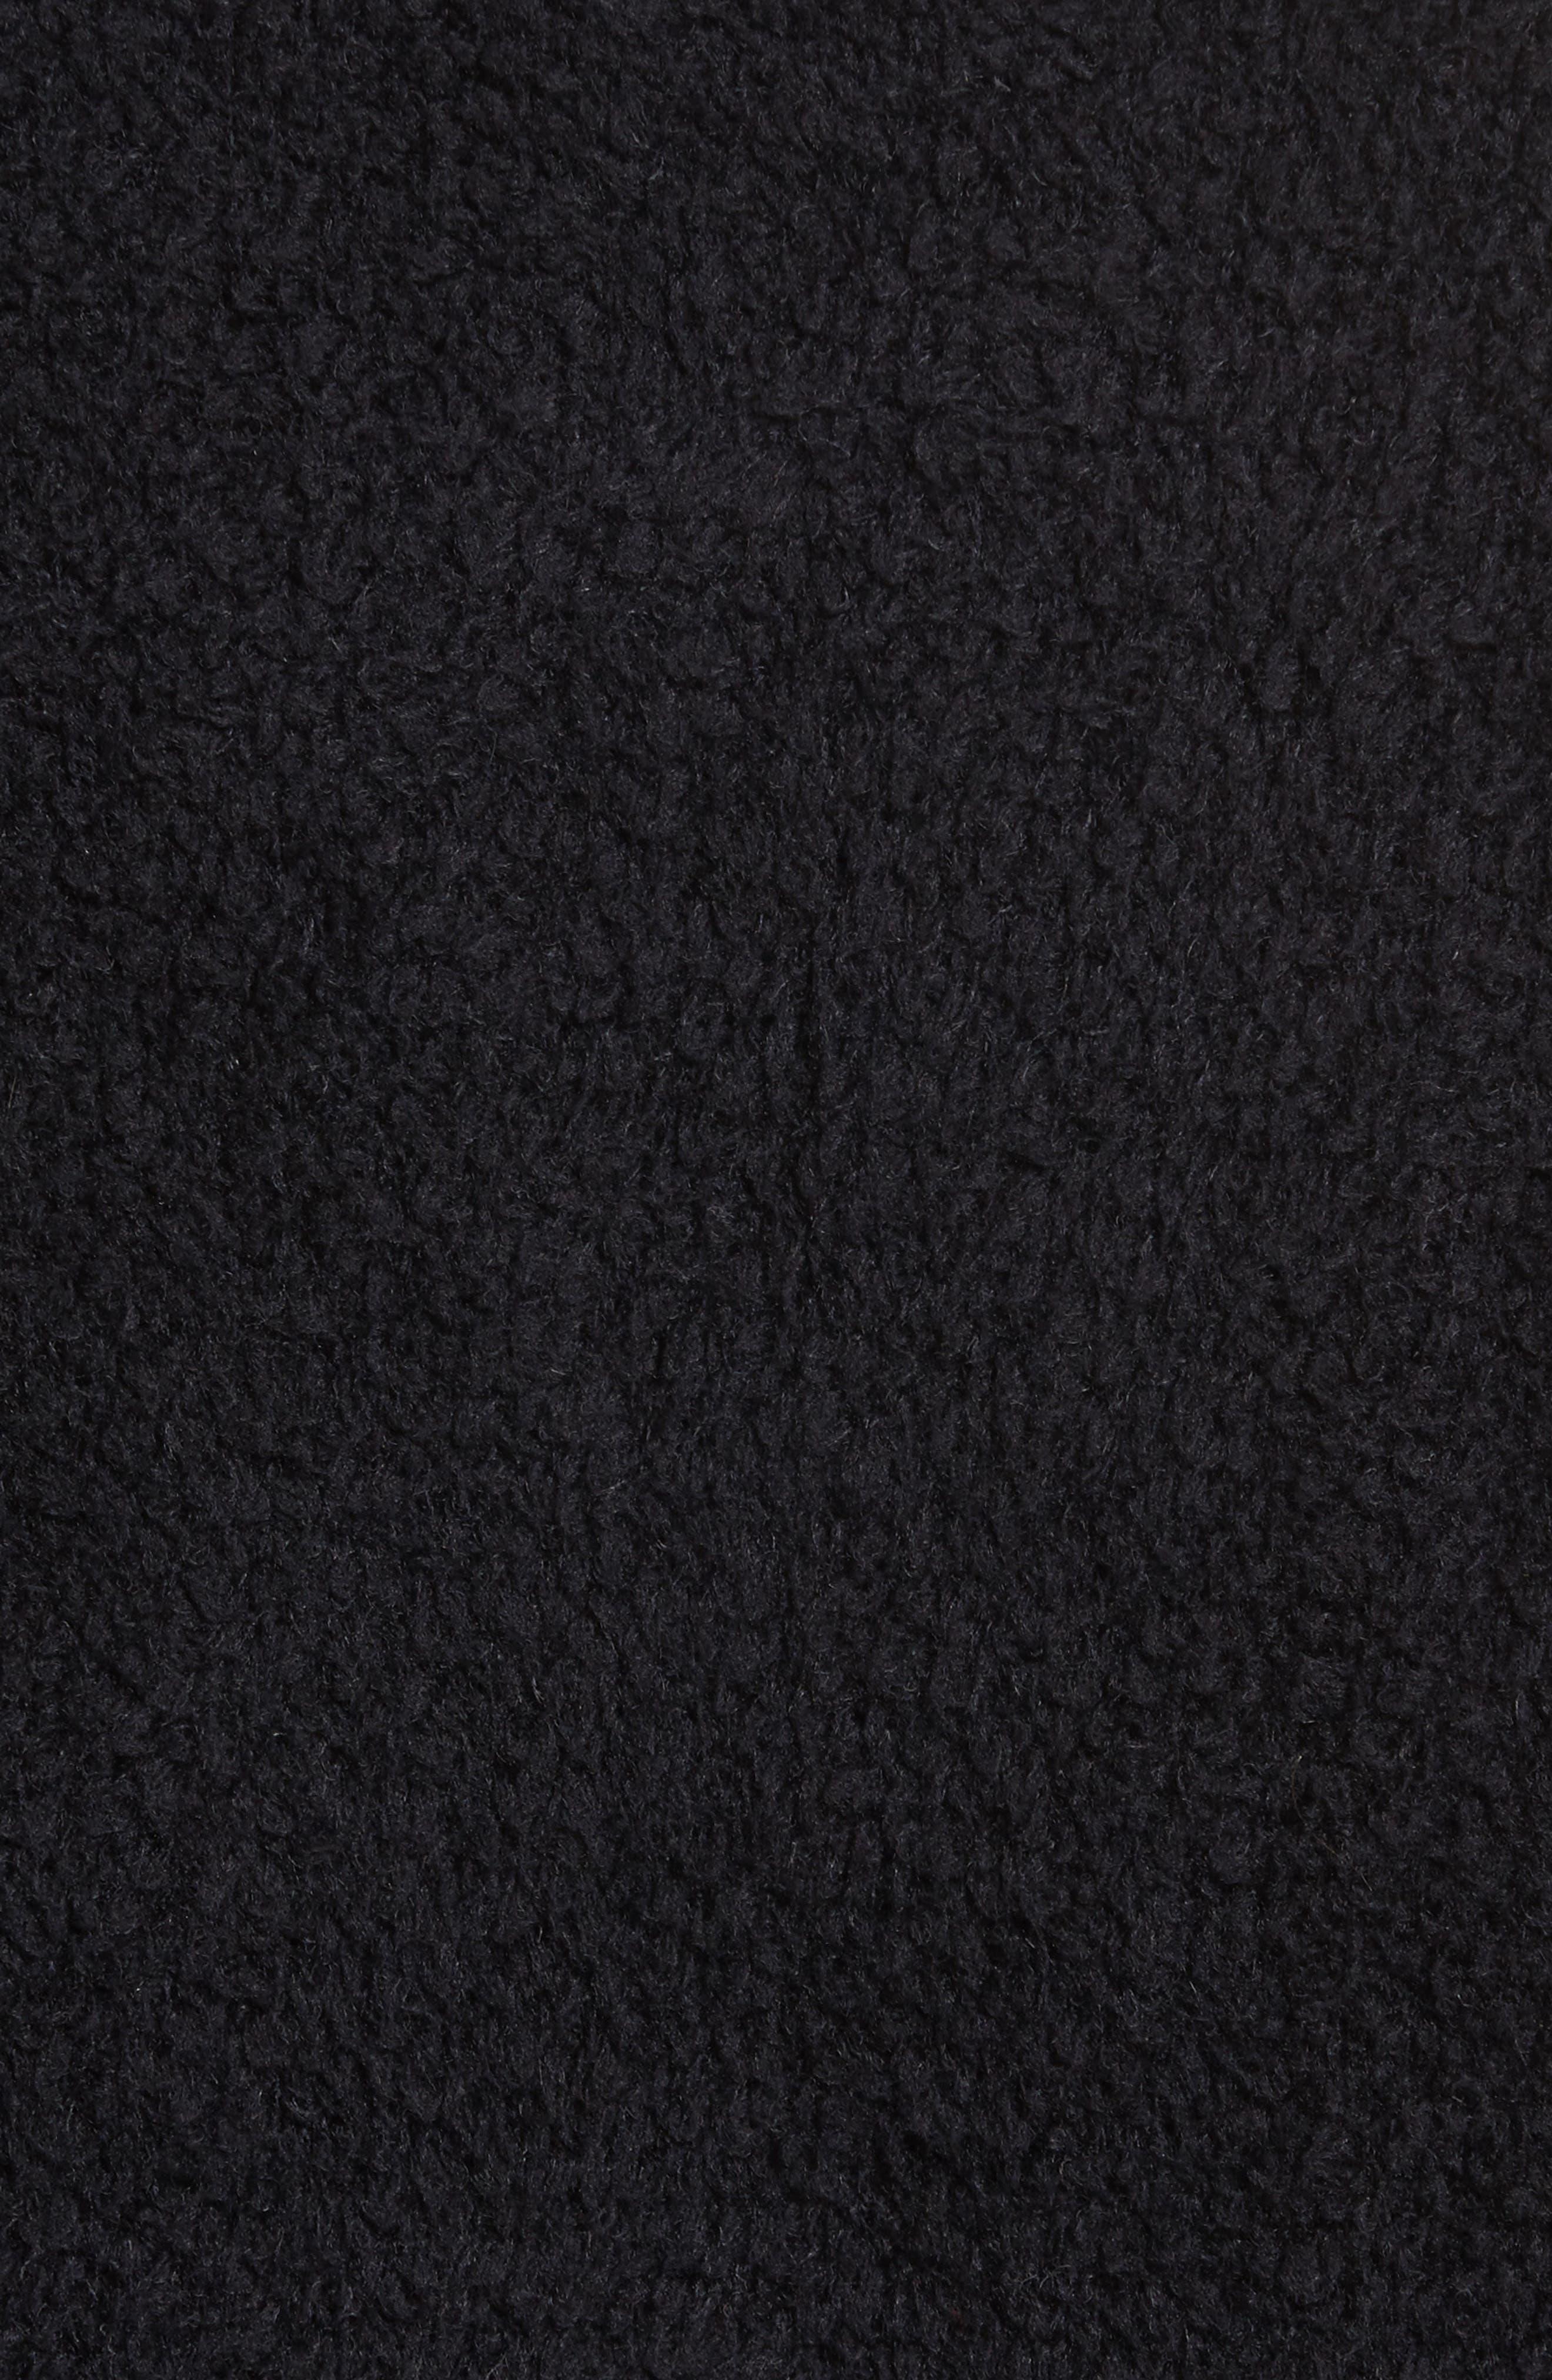 Fleece Wool Blend Bomber Jacket,                             Alternate thumbnail 6, color,                             001